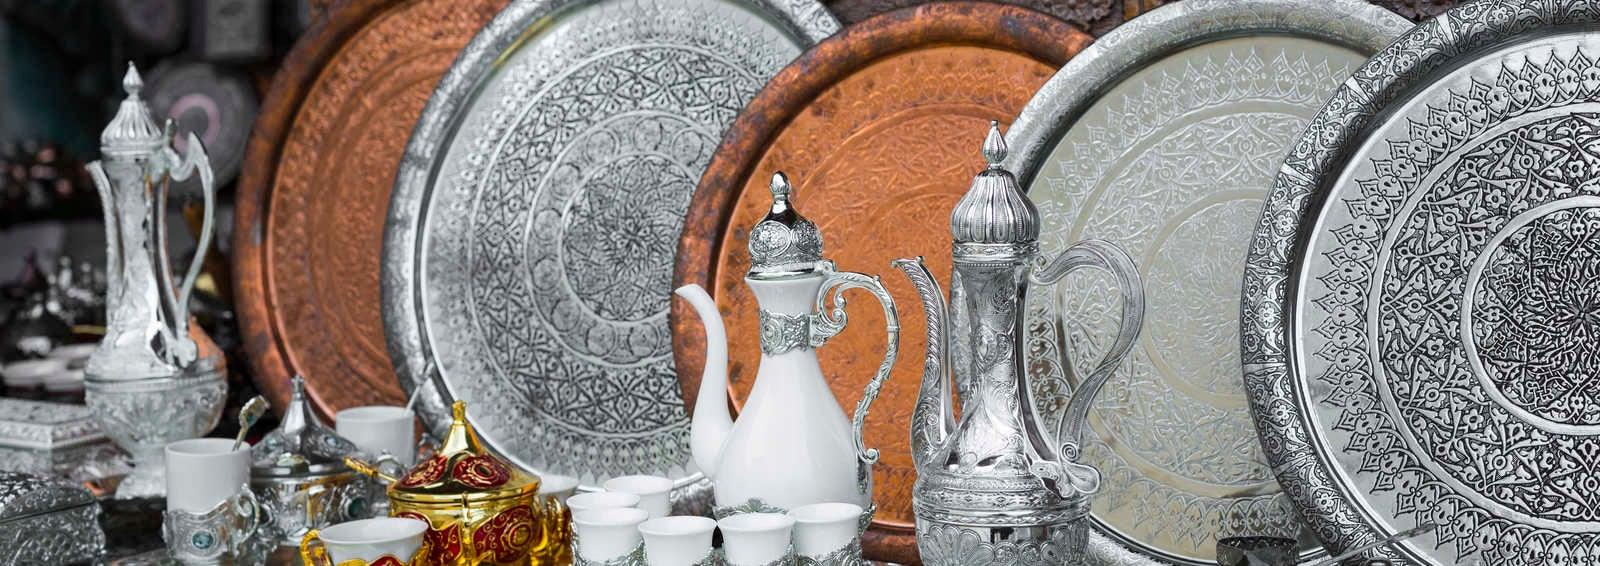 Copper coffee sets, Bosnia